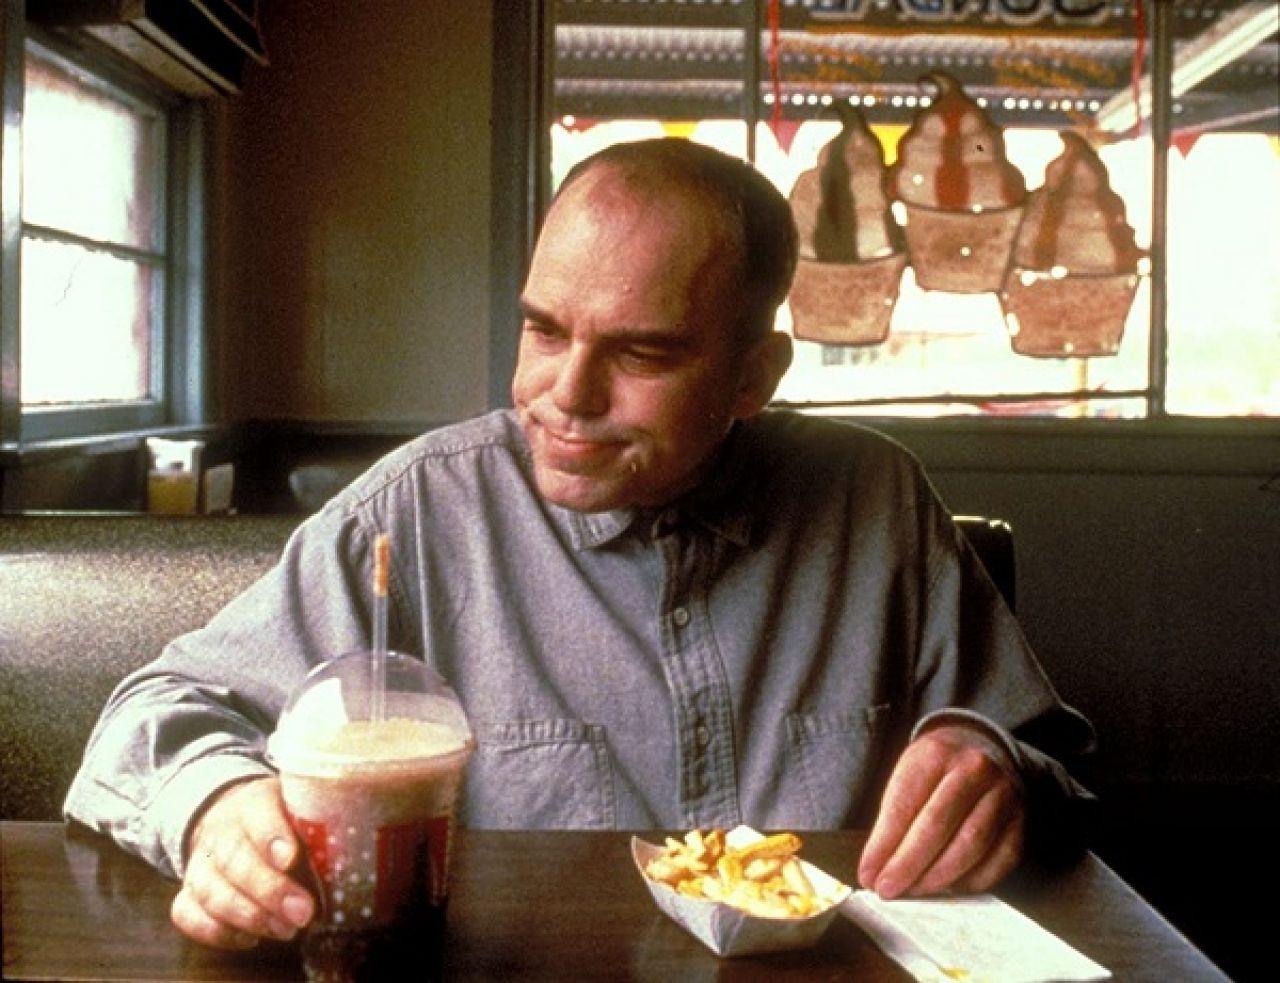 Still of Billy Bob Thornton as Karl Childers eating at Garry's Slingblade Diner in Sling Blade Film